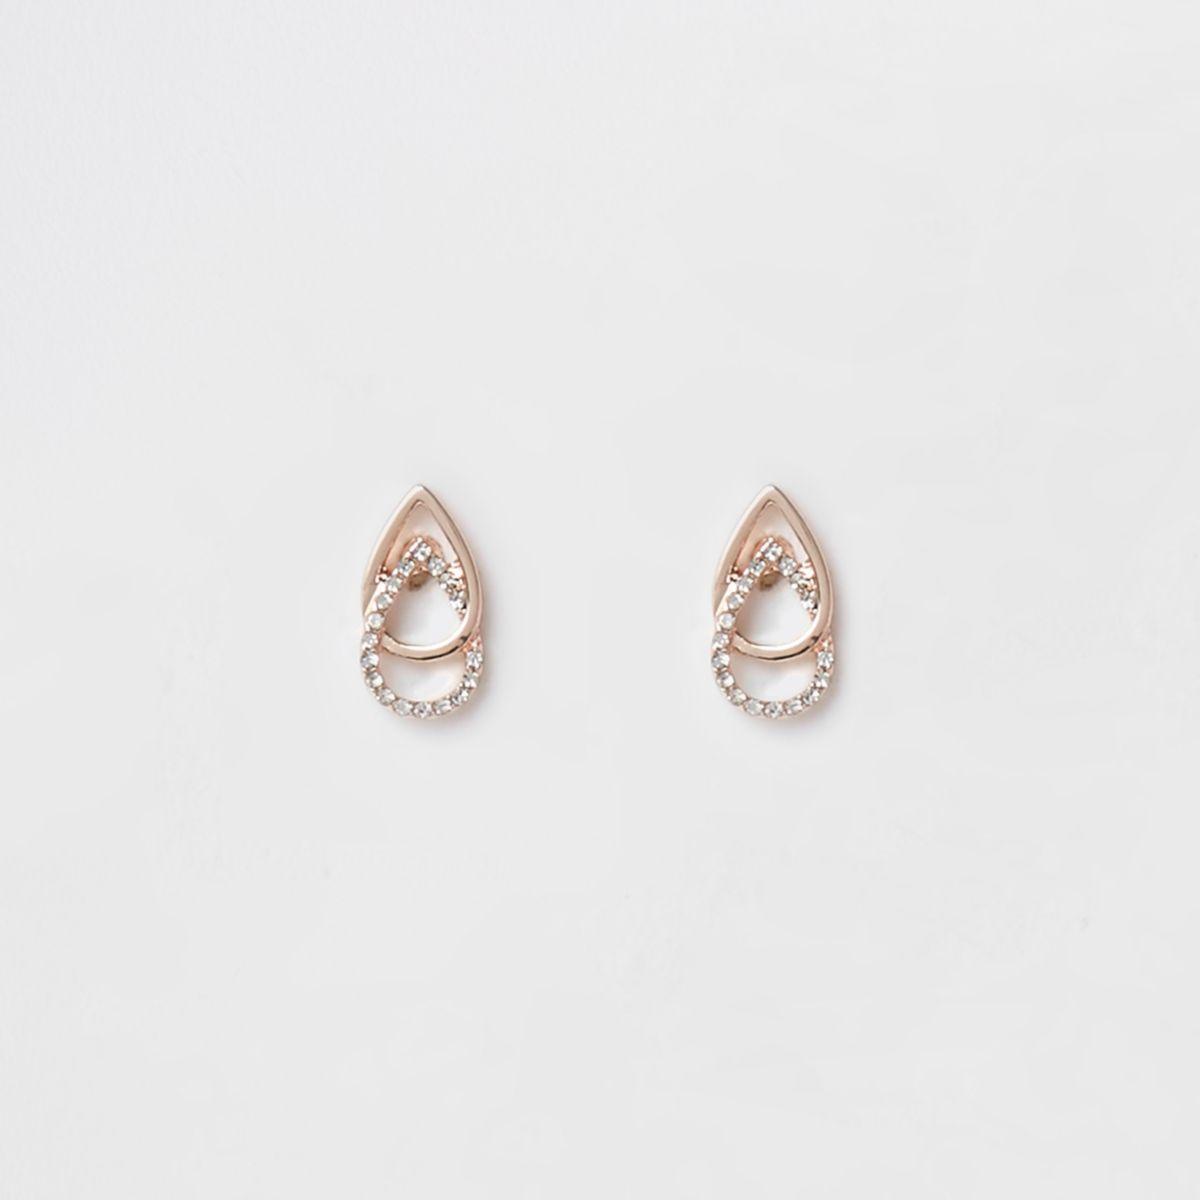 Rose gold tone diamante interlink earrings